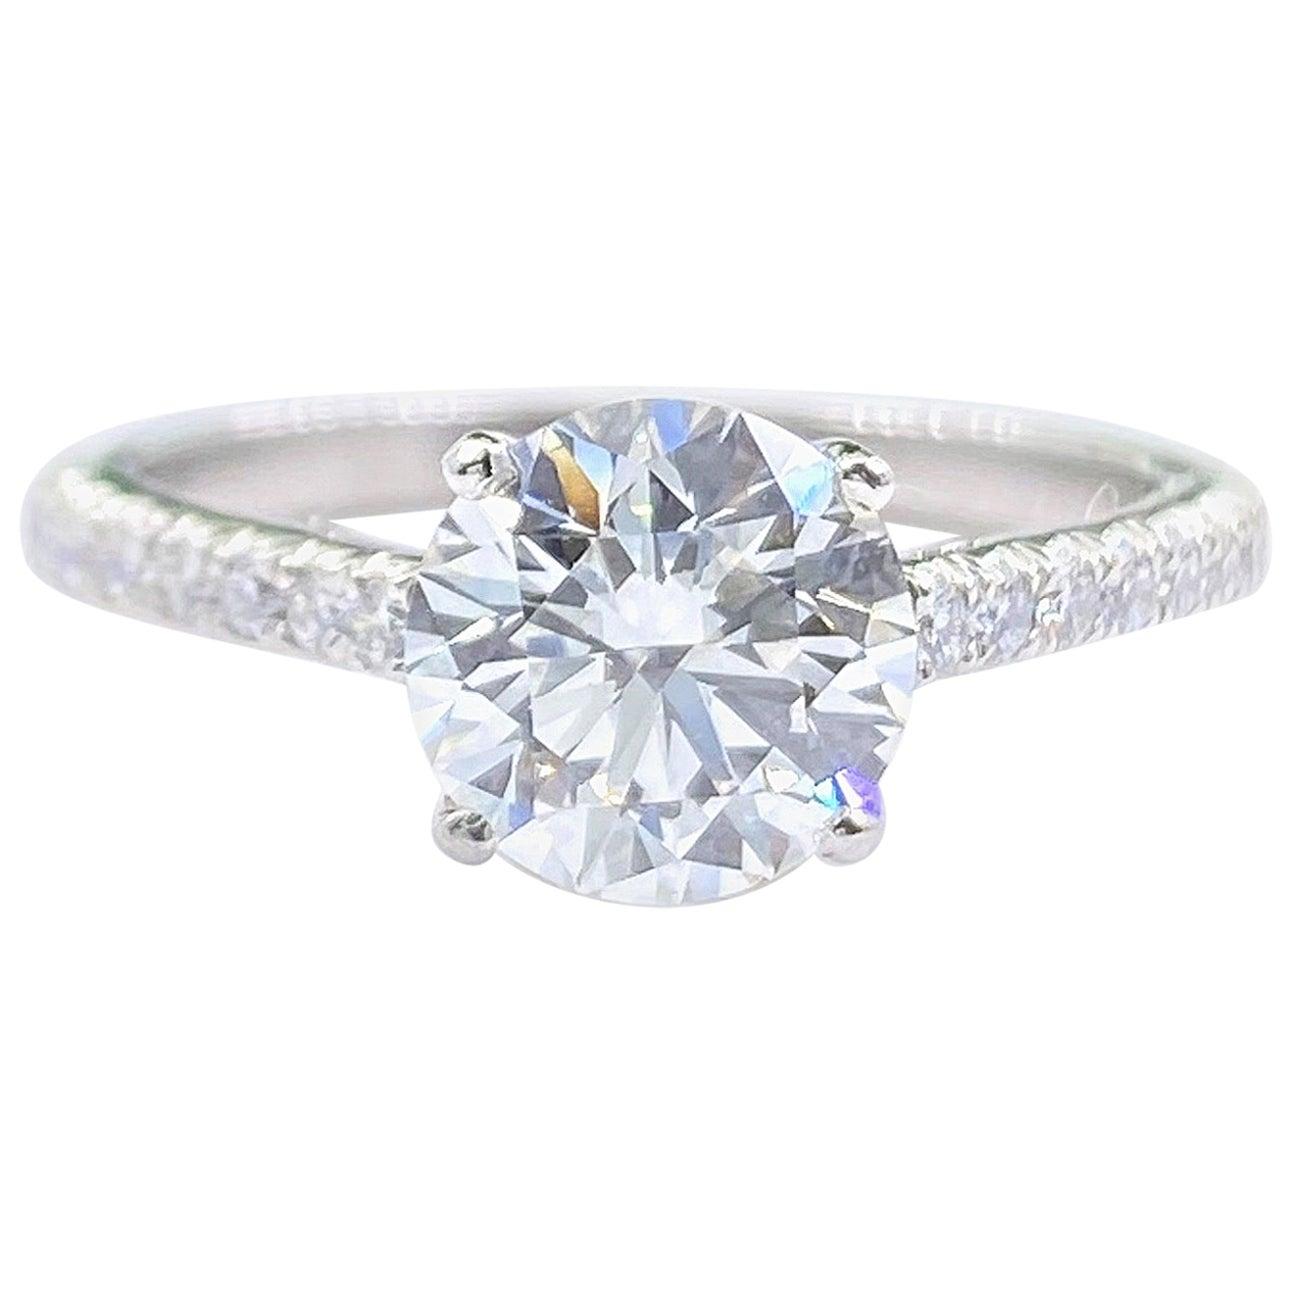 Tiffany & Co NOVO 1.62 Carat E VS1 Round Diamond Engagement Ring